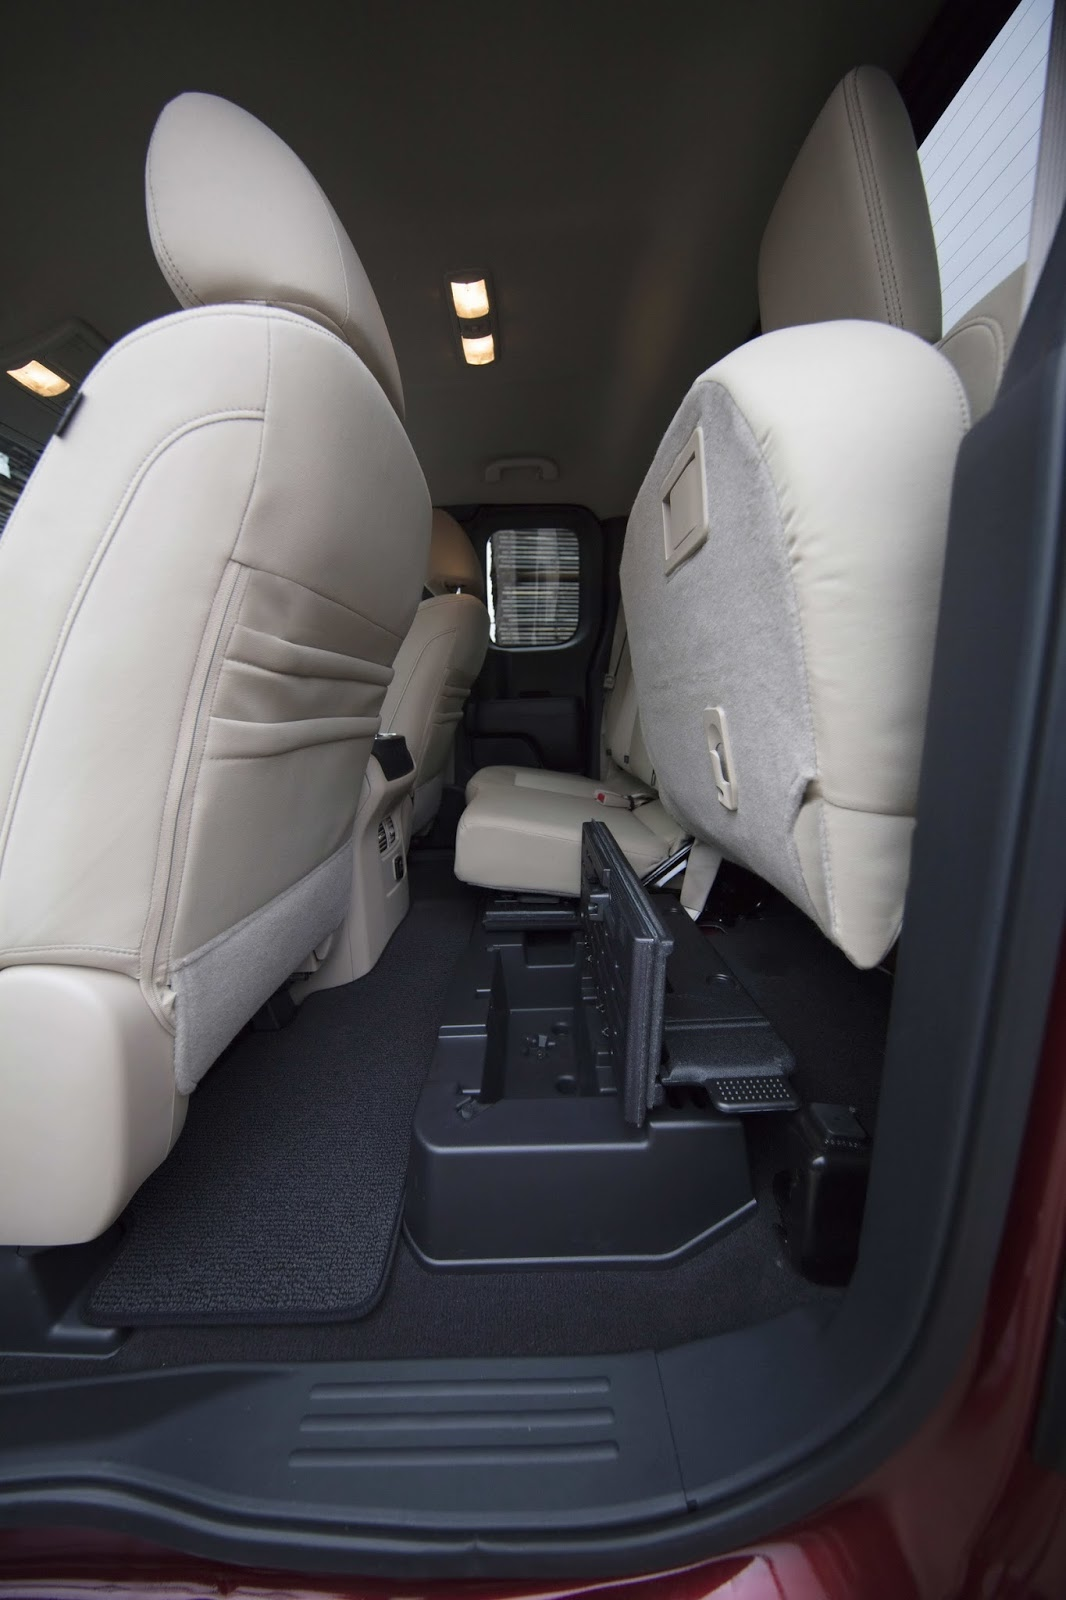 Nissan Titan King Cab 2017 (10)